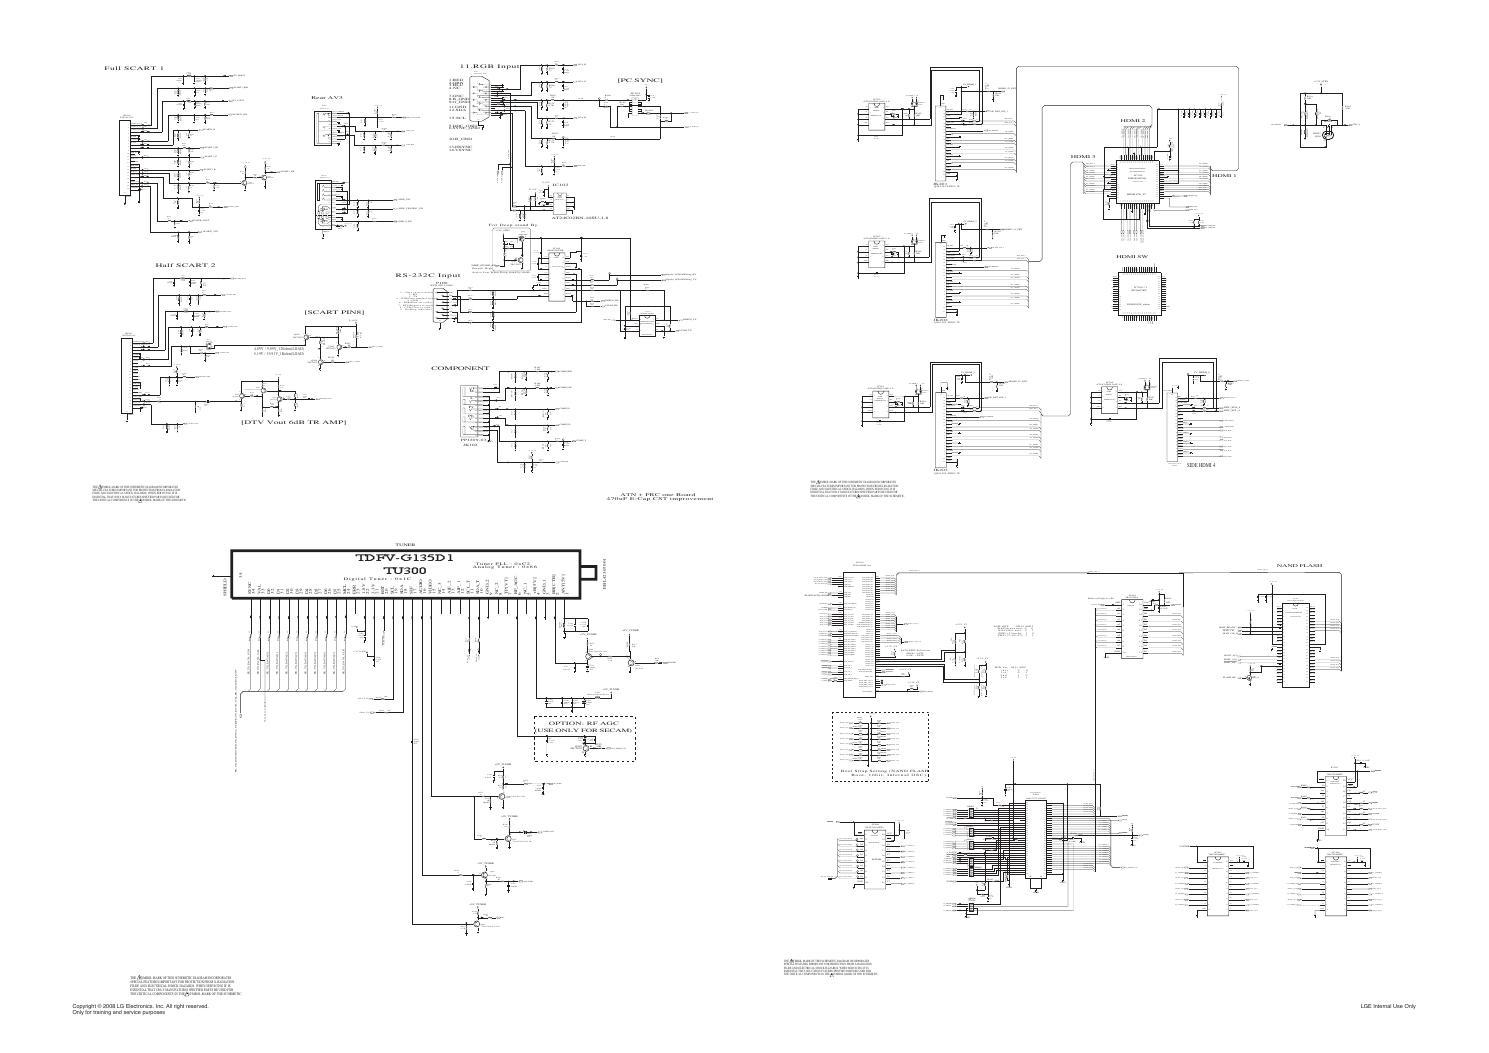 Manual de serviço tv lcd lg 37lg7000 za chassis ld88f by